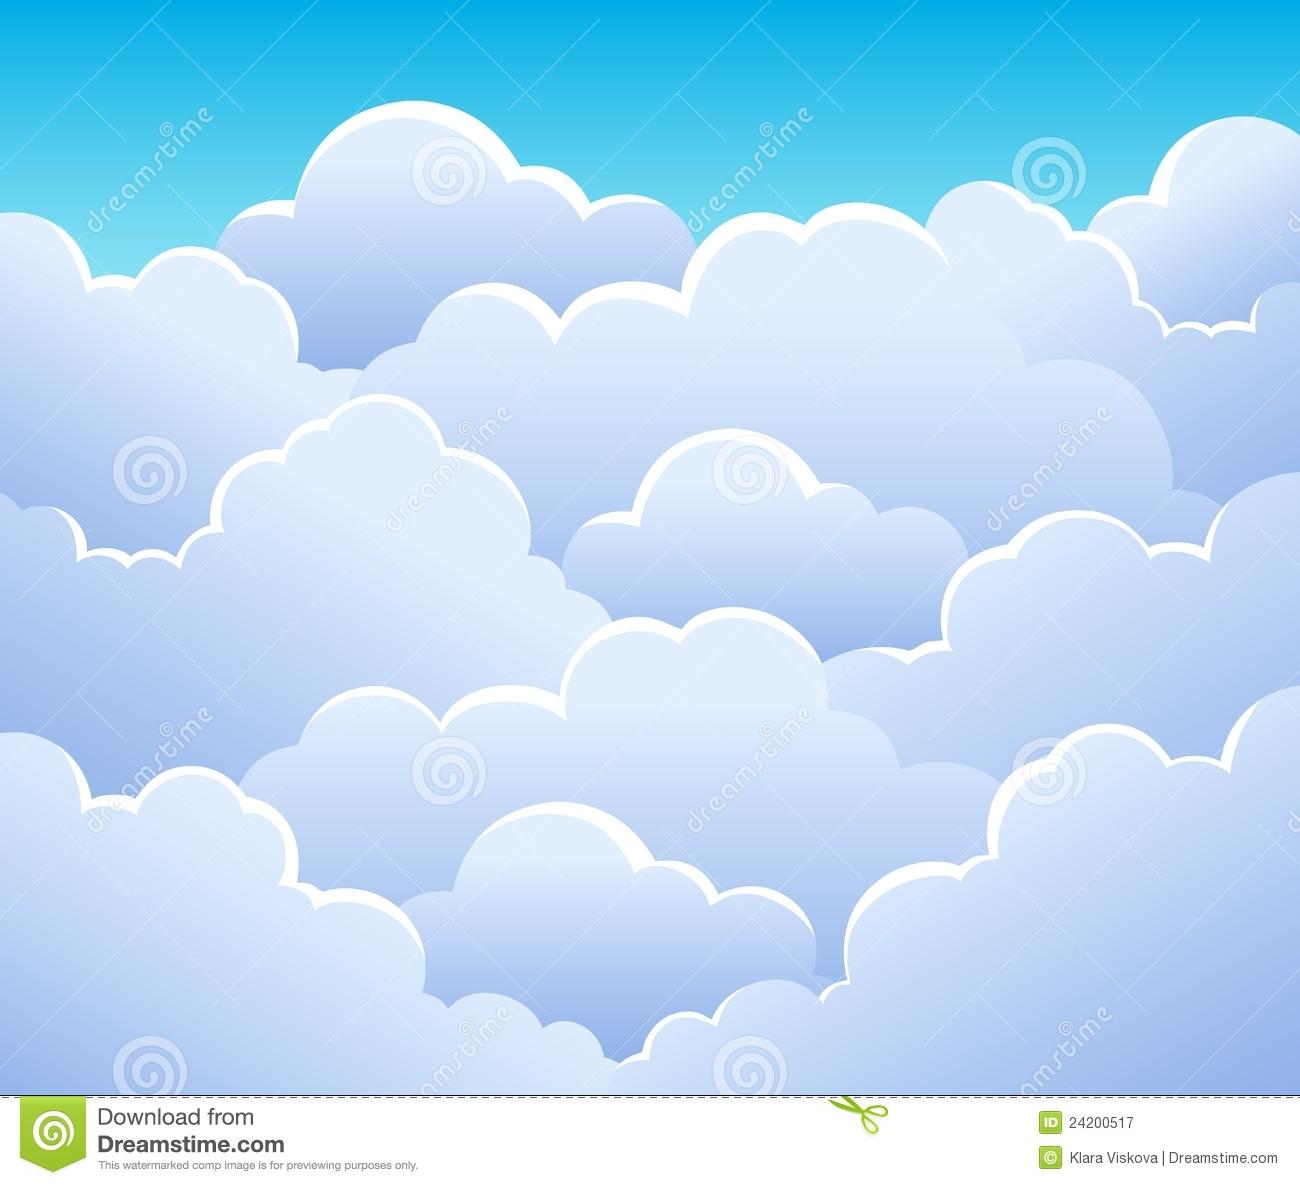 cloud clipart background - photo #40